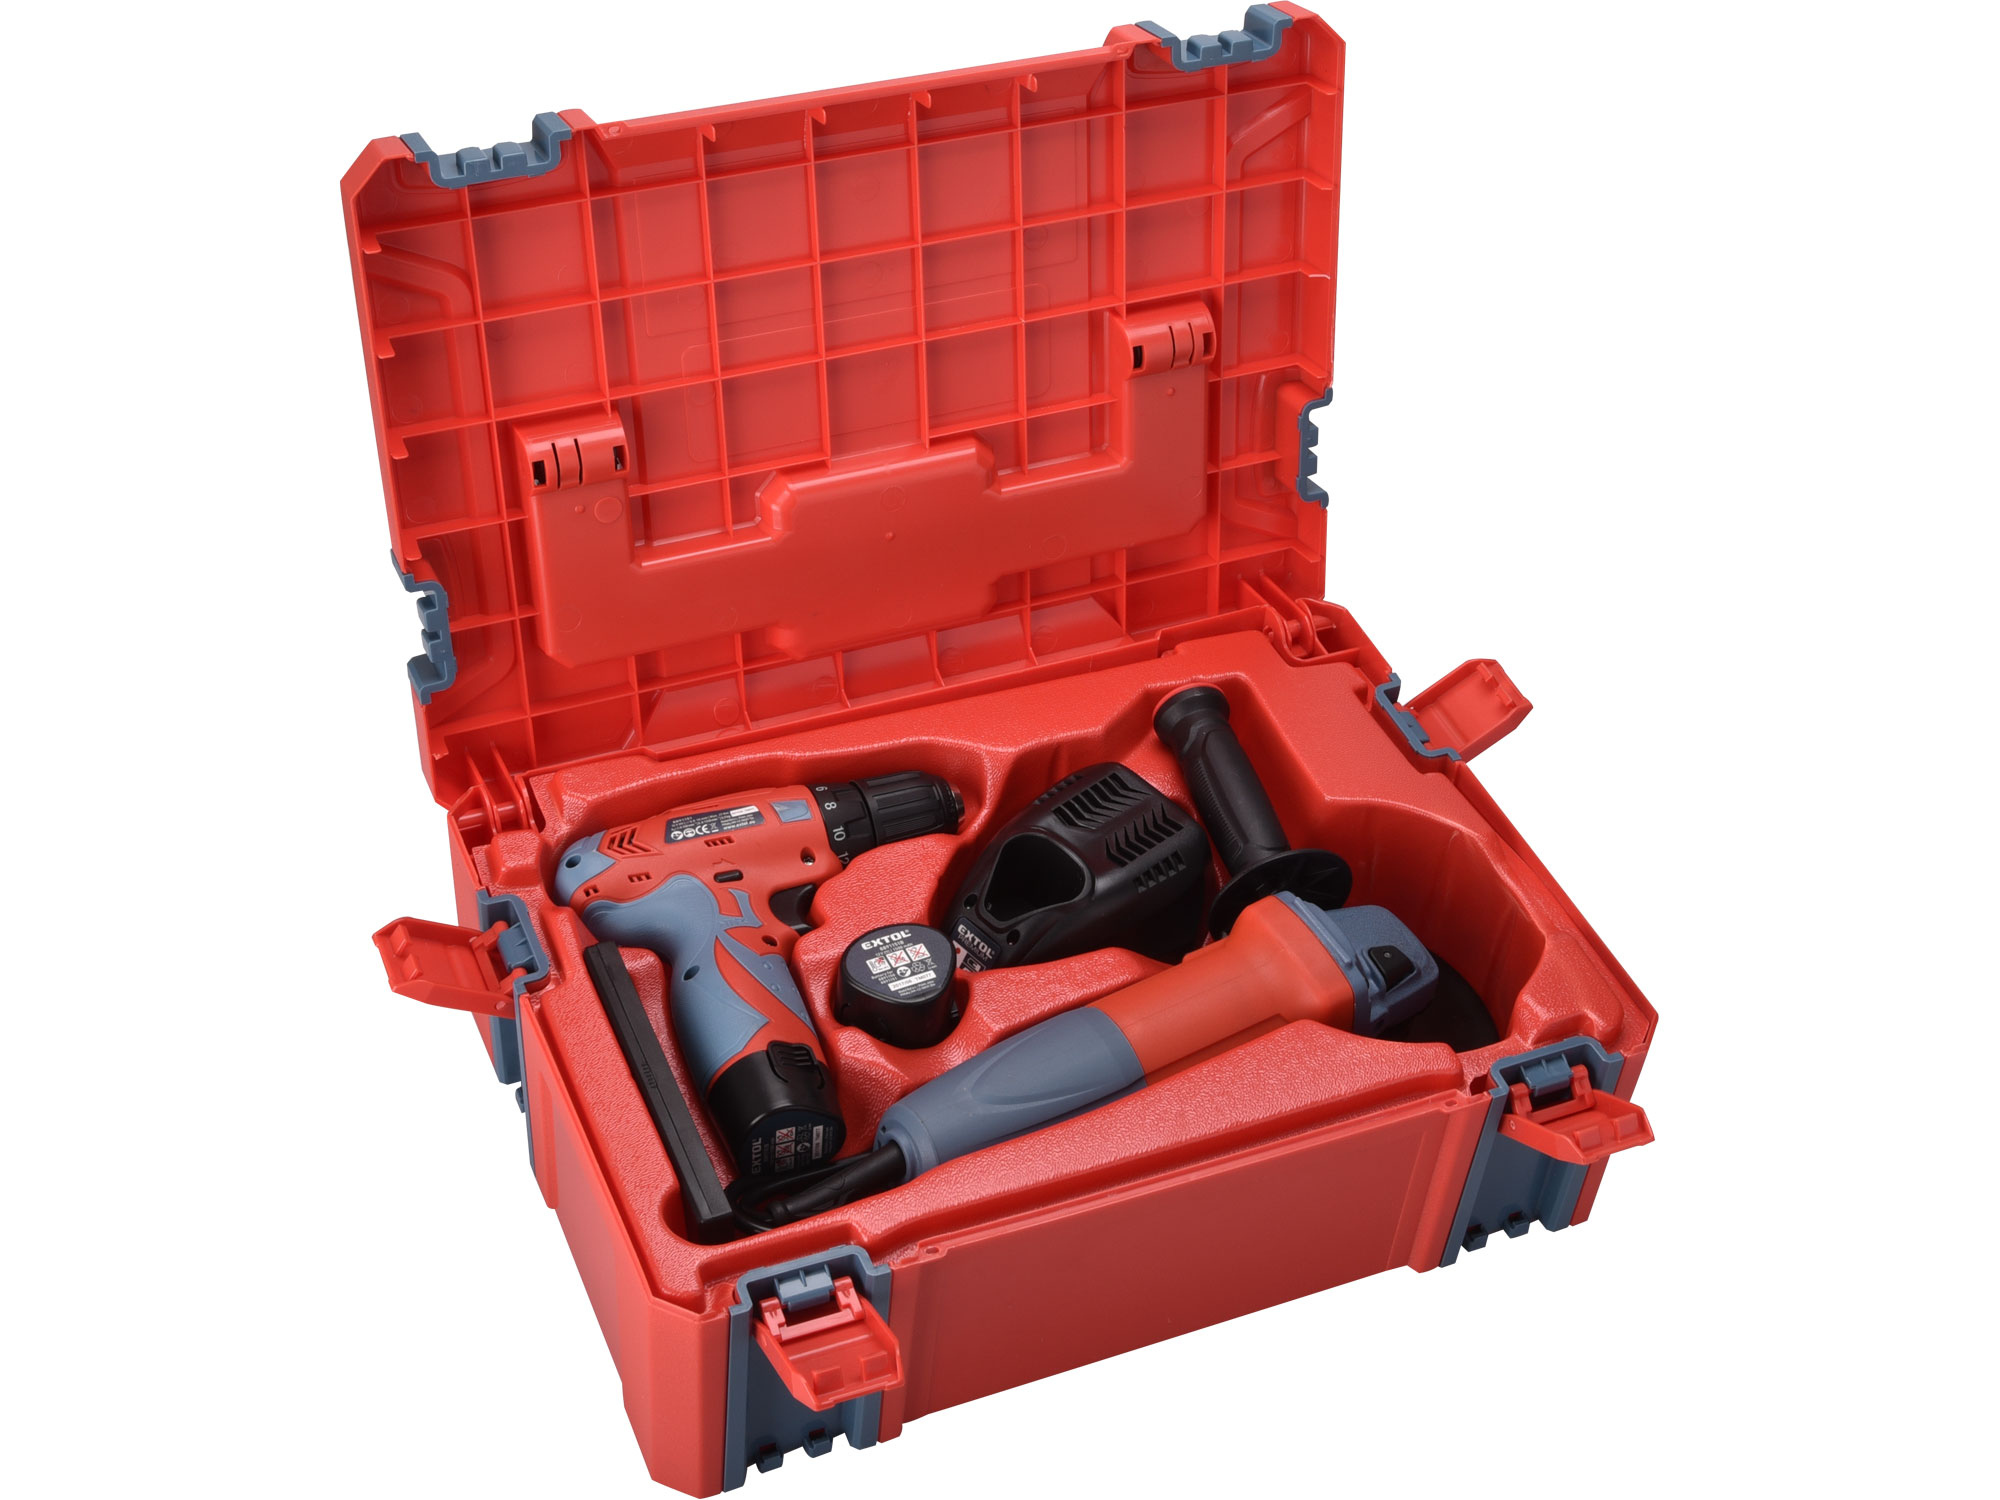 Vrtačka aku, 12V Li-ion (2x) a bruska úhlová 125mm v plastovém boxu EXTOL PREMIUM 8898311